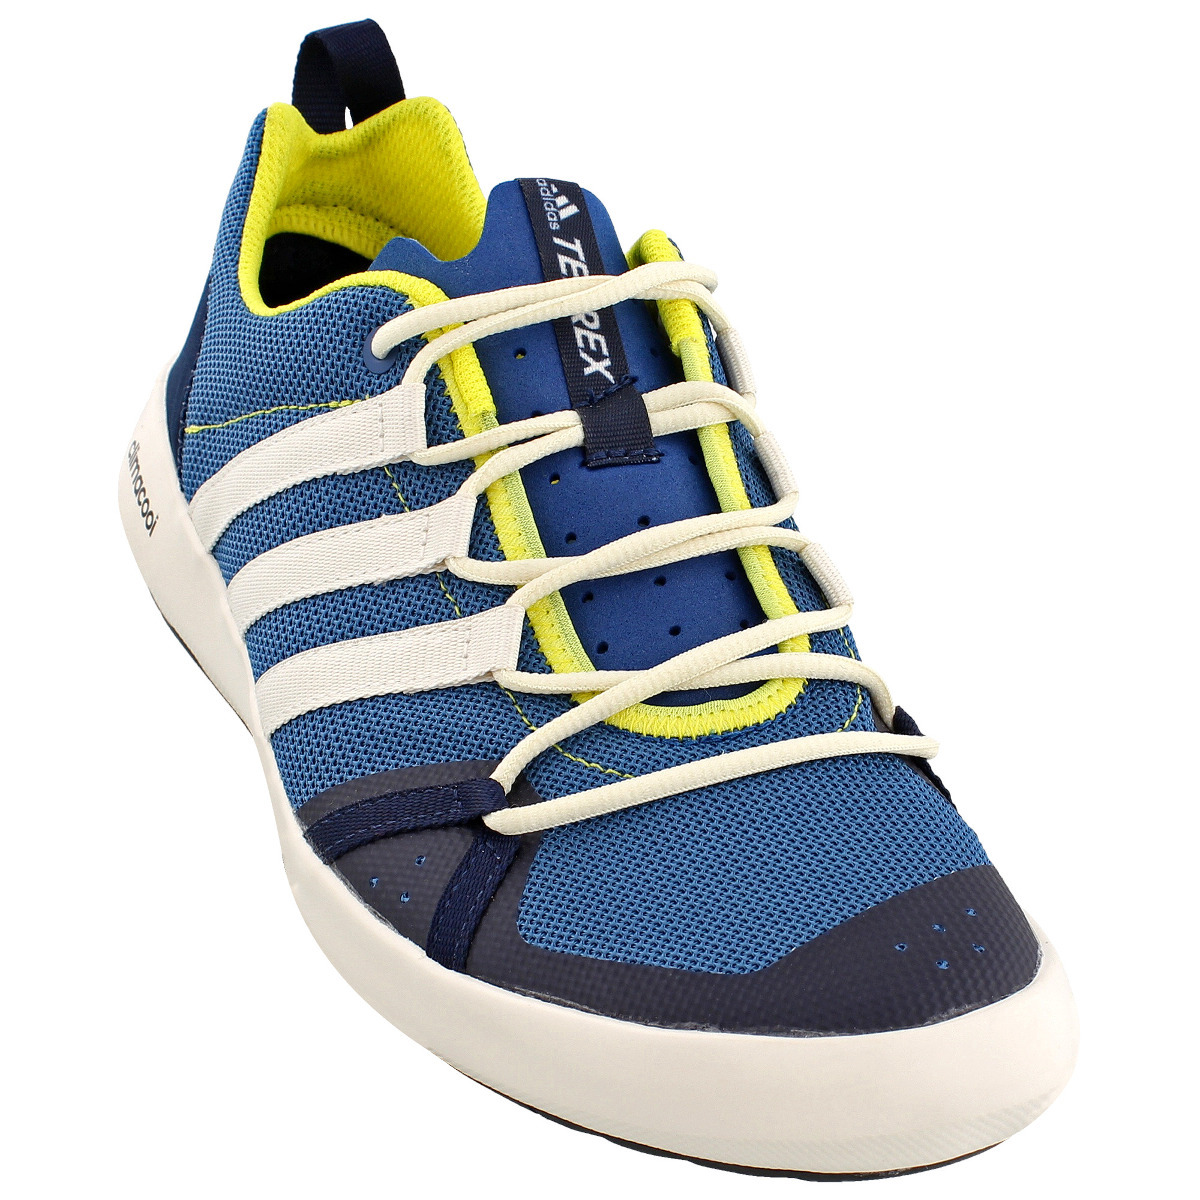 ADIDAS Men's Terrex Climacool Boat Outdoor Shoes, Blue